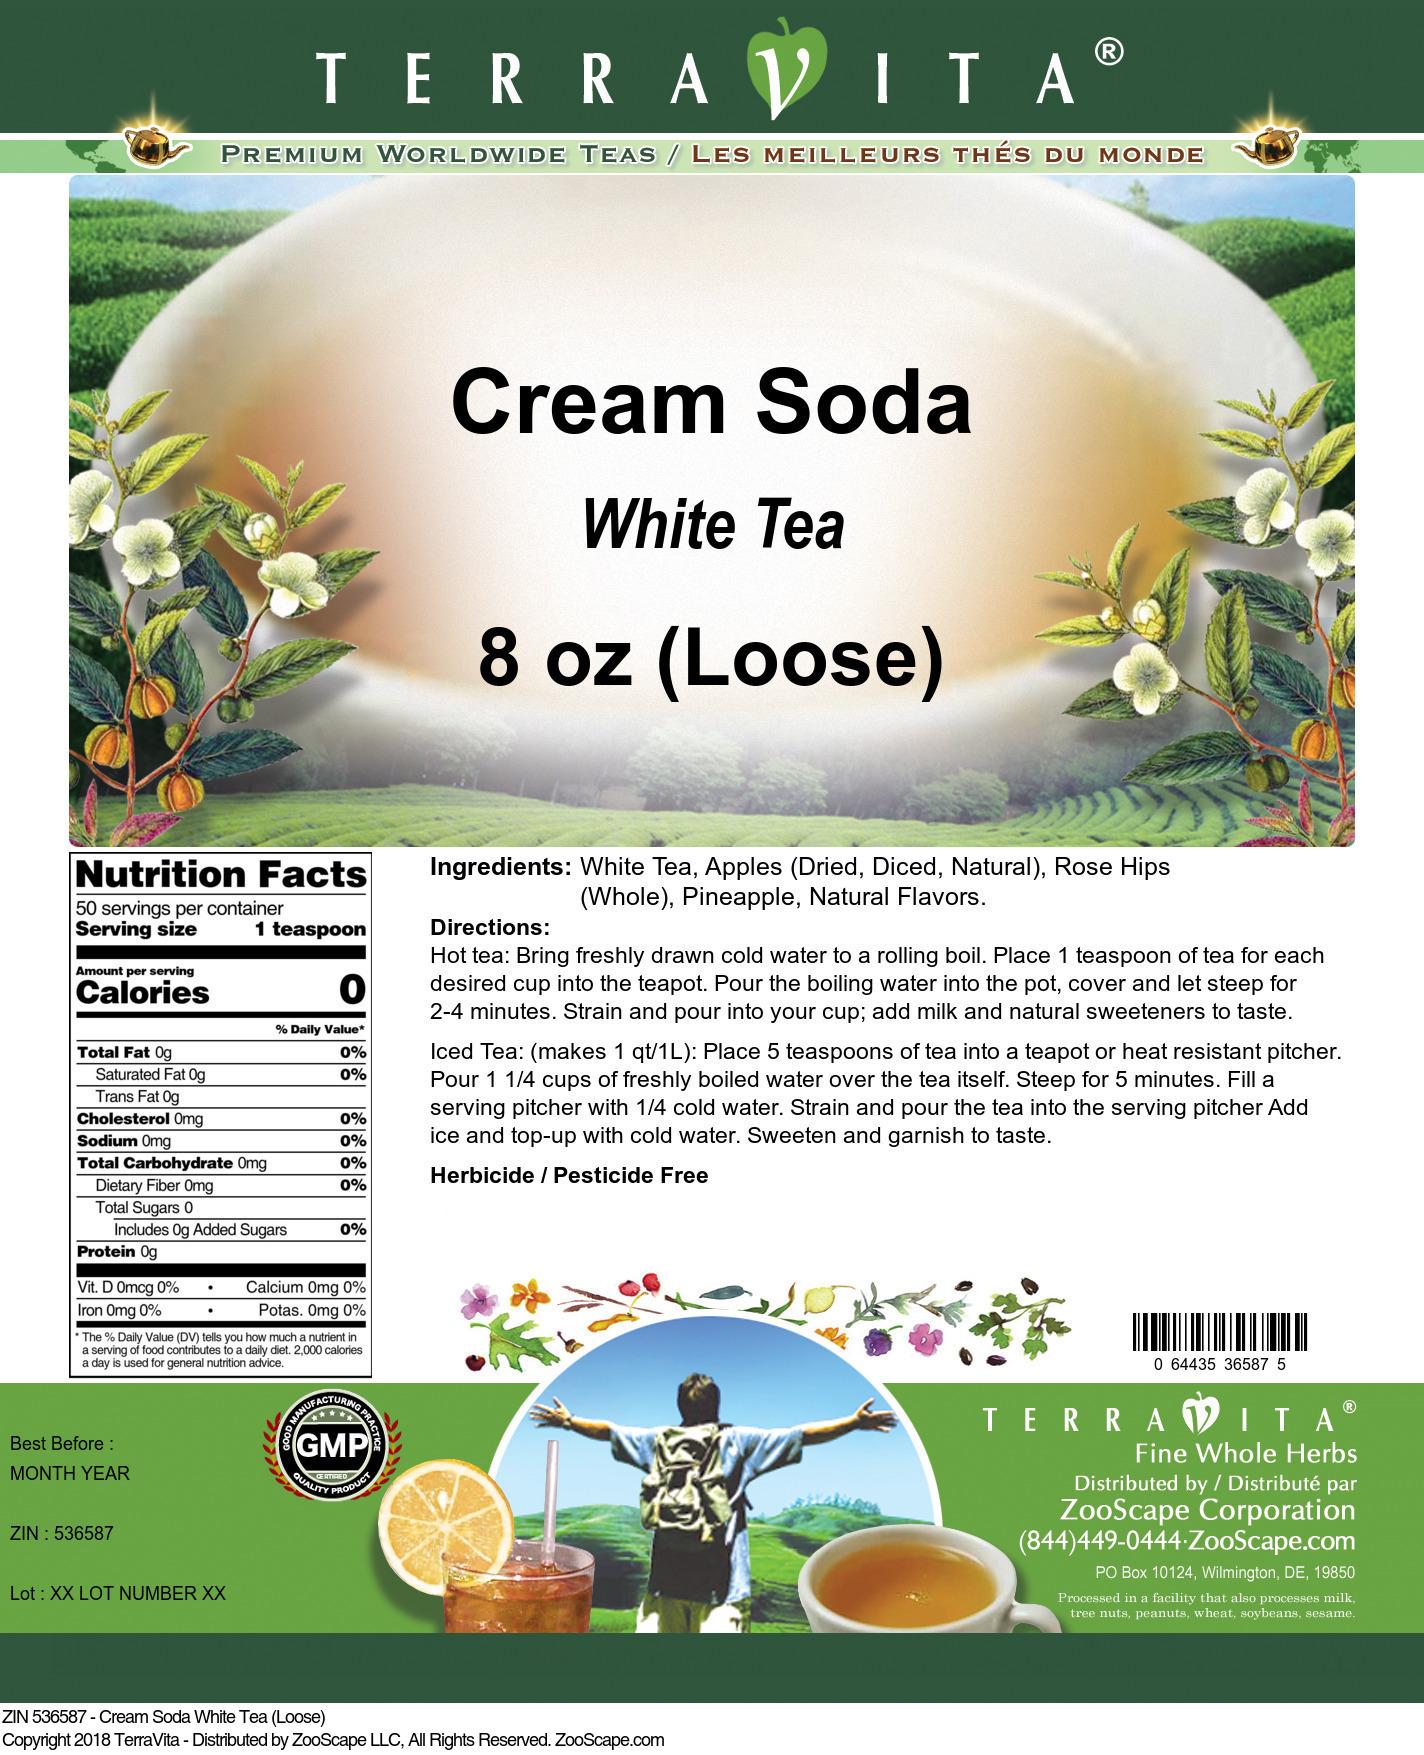 Cream Soda White Tea